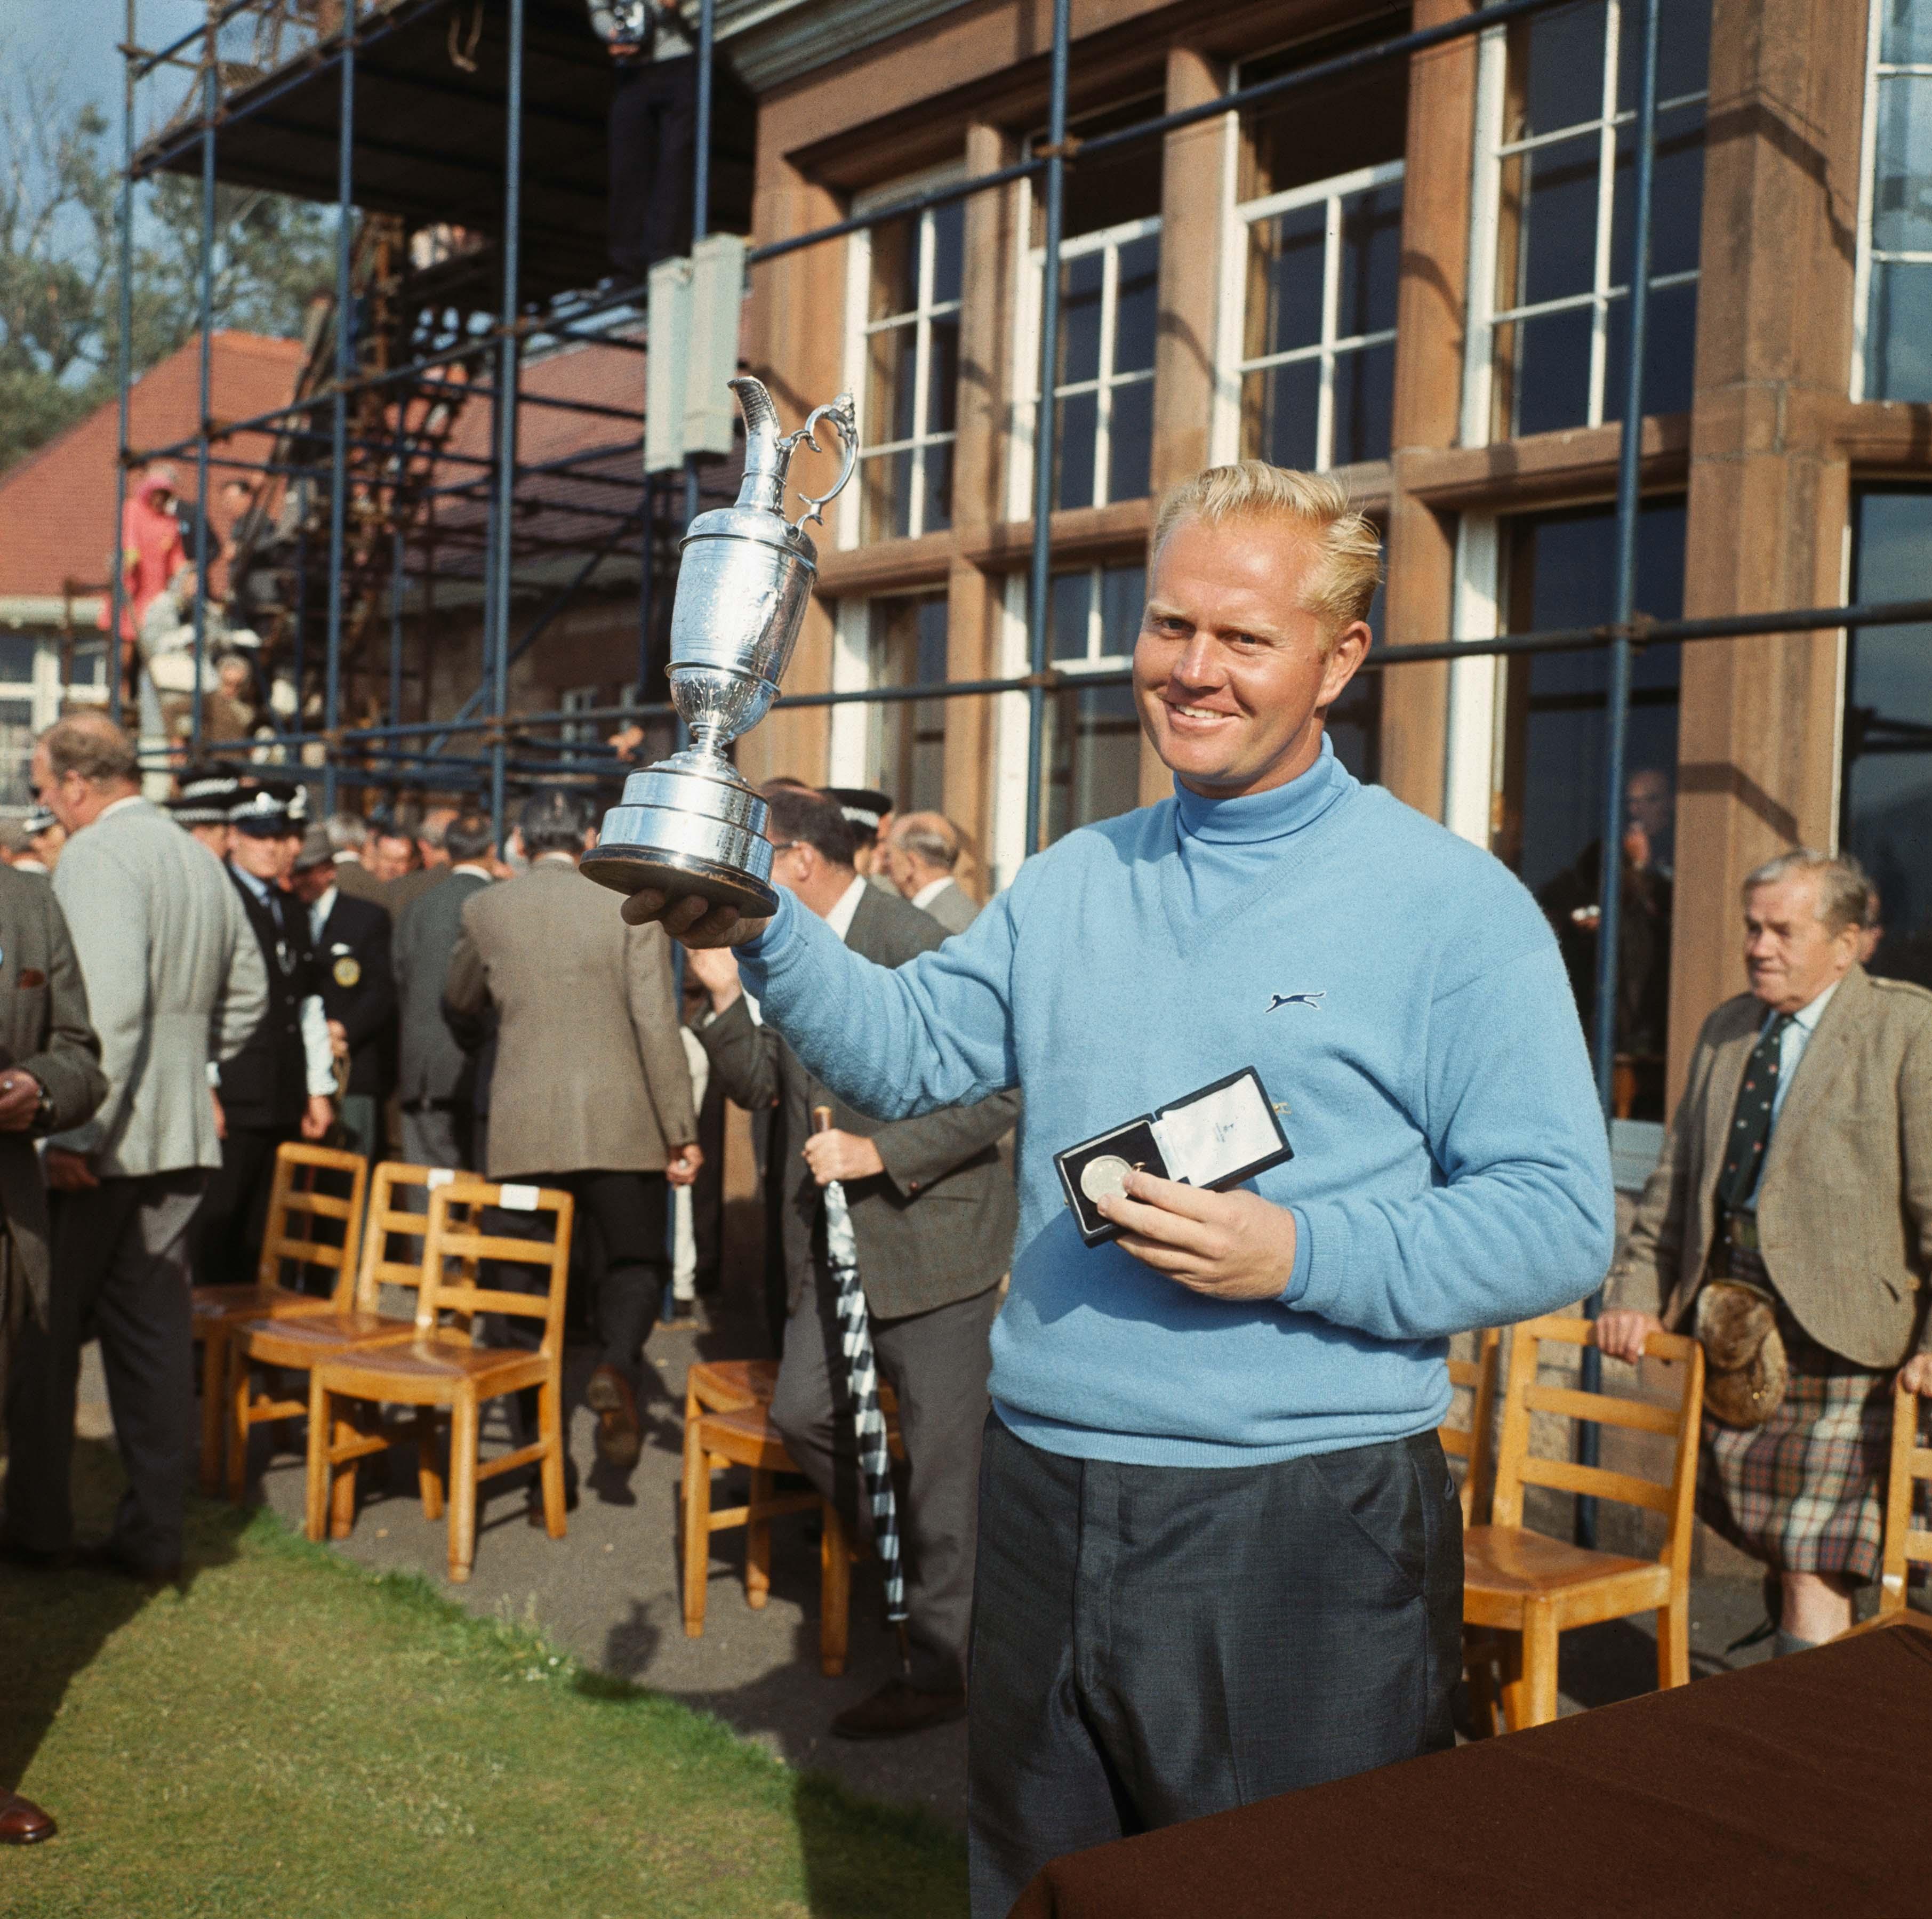 Claret jug, 1966